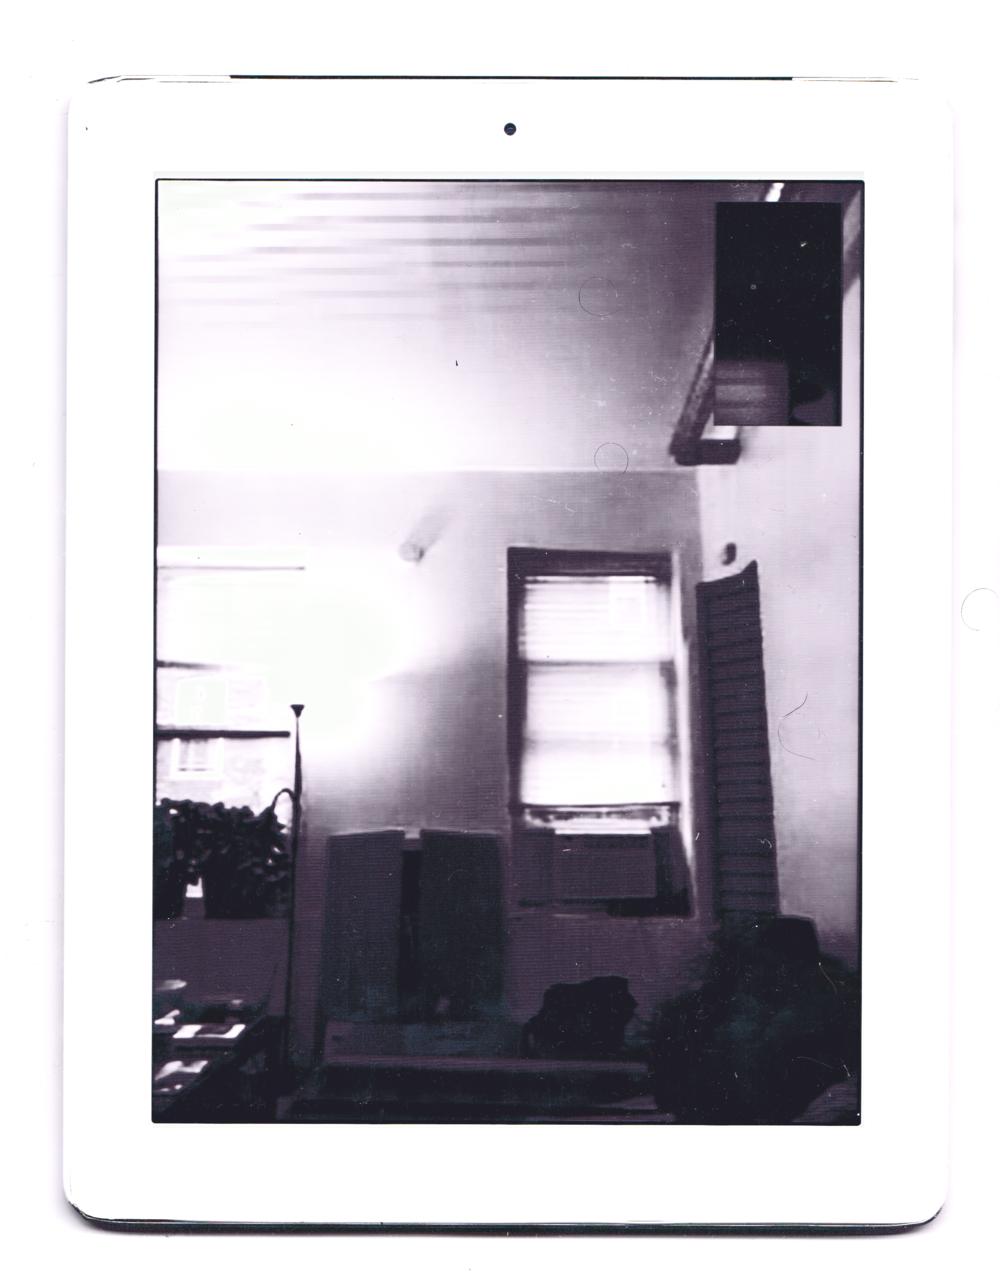 Livingroom_2 copy.png